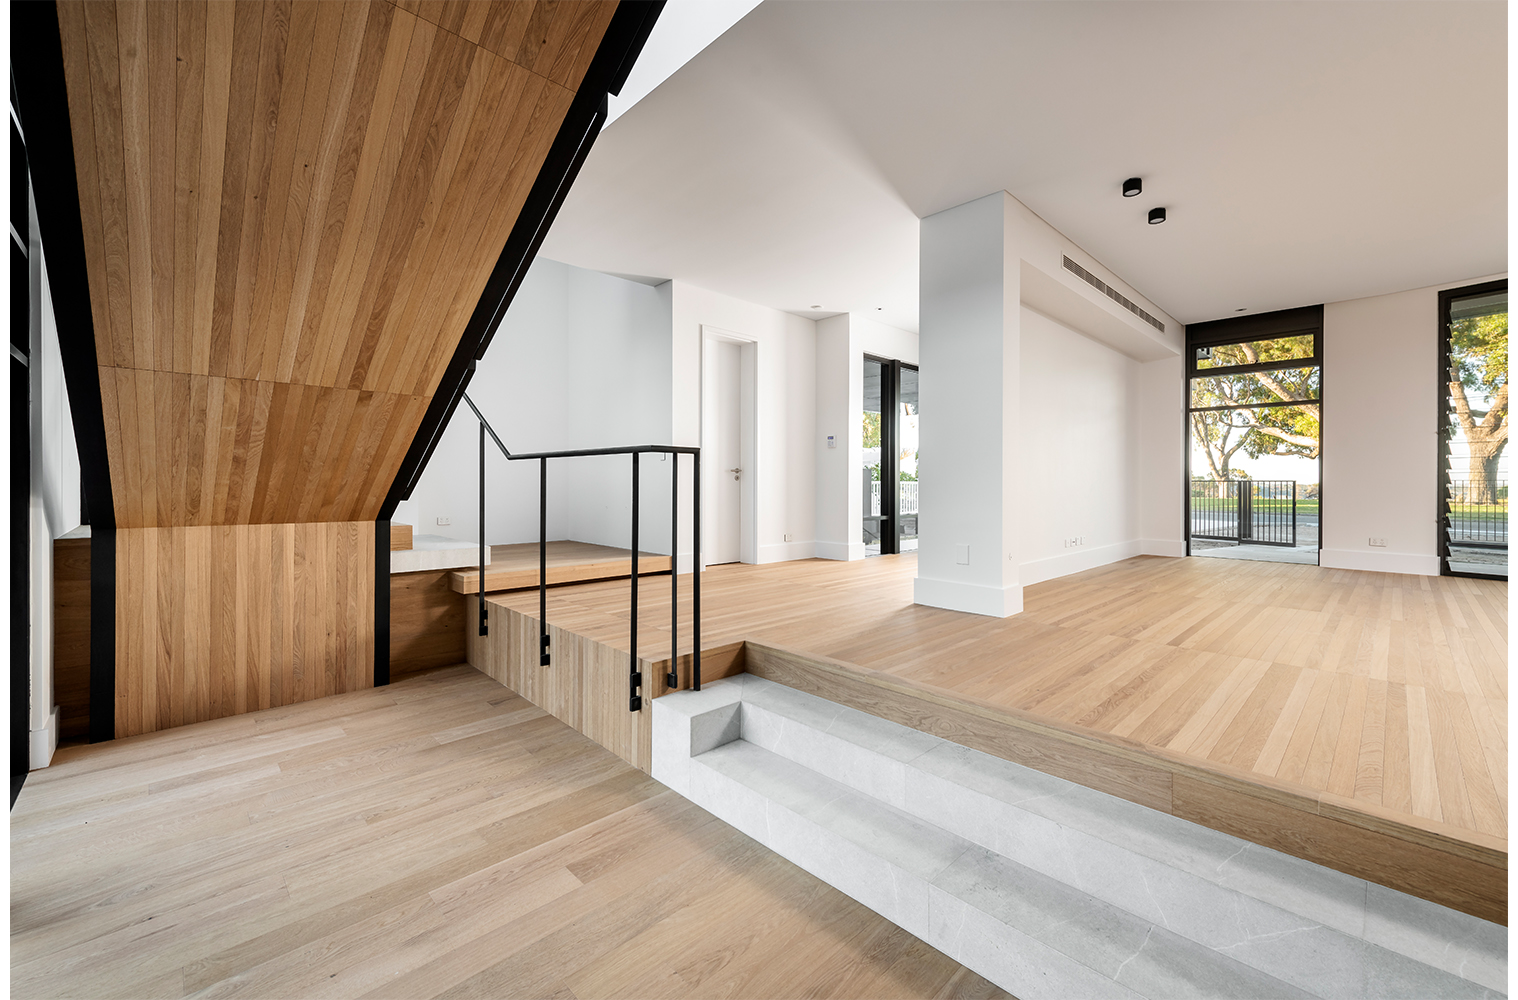 maek-luxury-home-design-inspiration-mosman-park-groundfloor-5.jpg